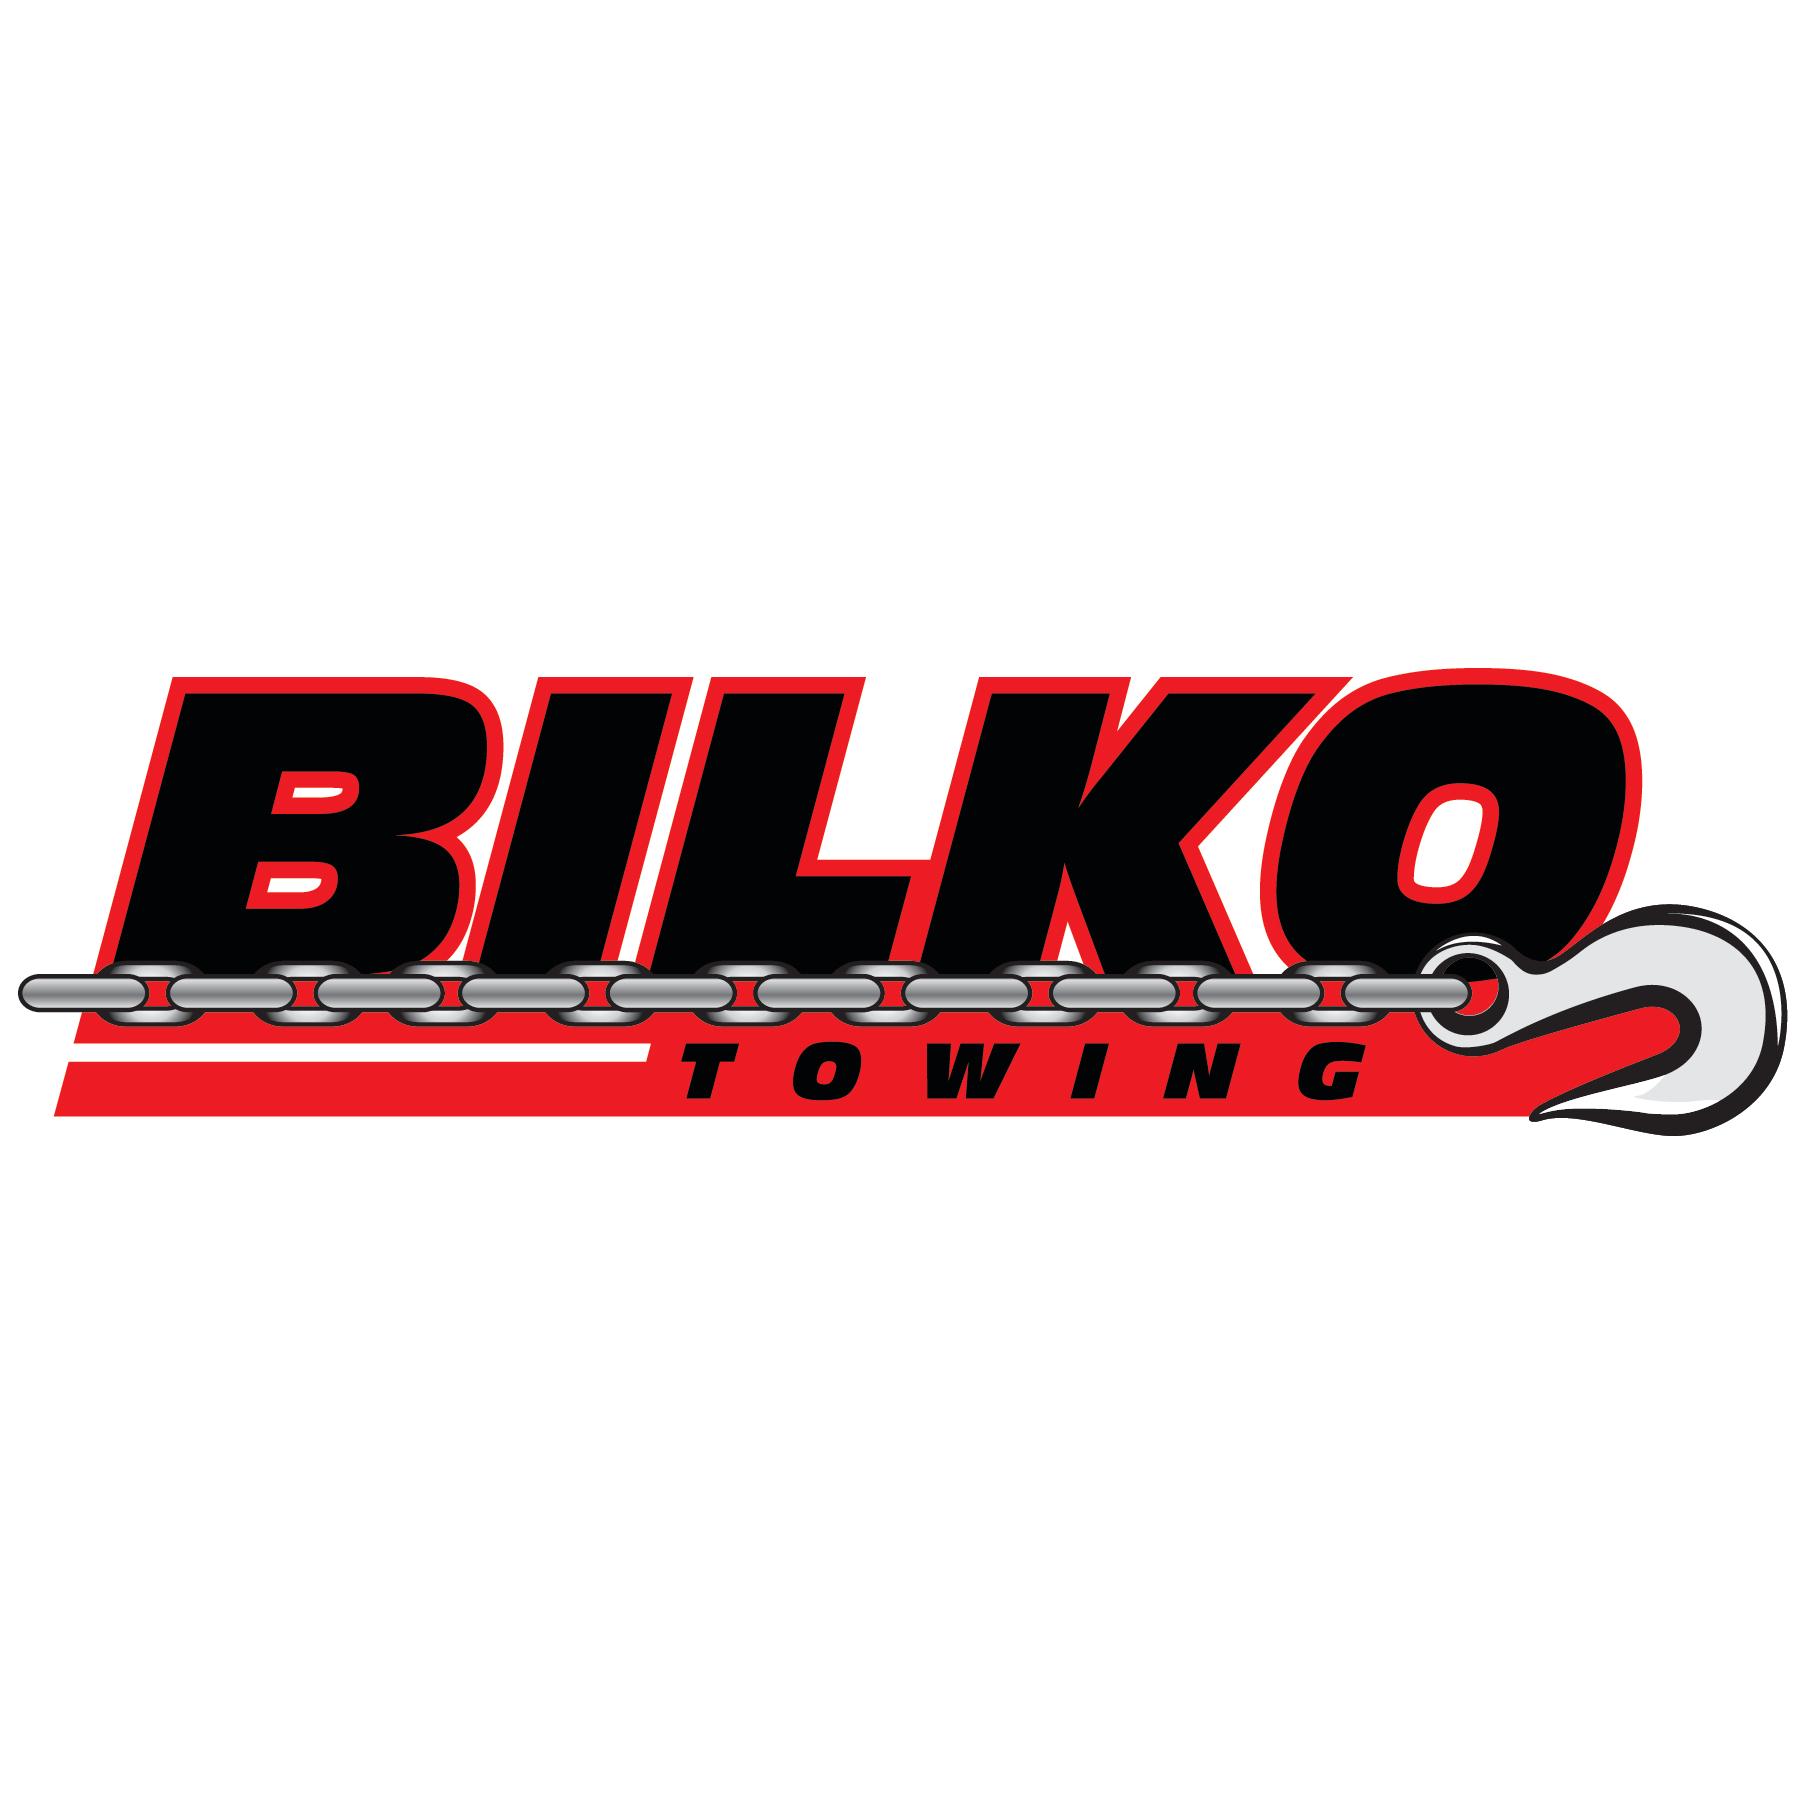 Bilko Towing - Yakima, WA - Auto Towing & Wrecking